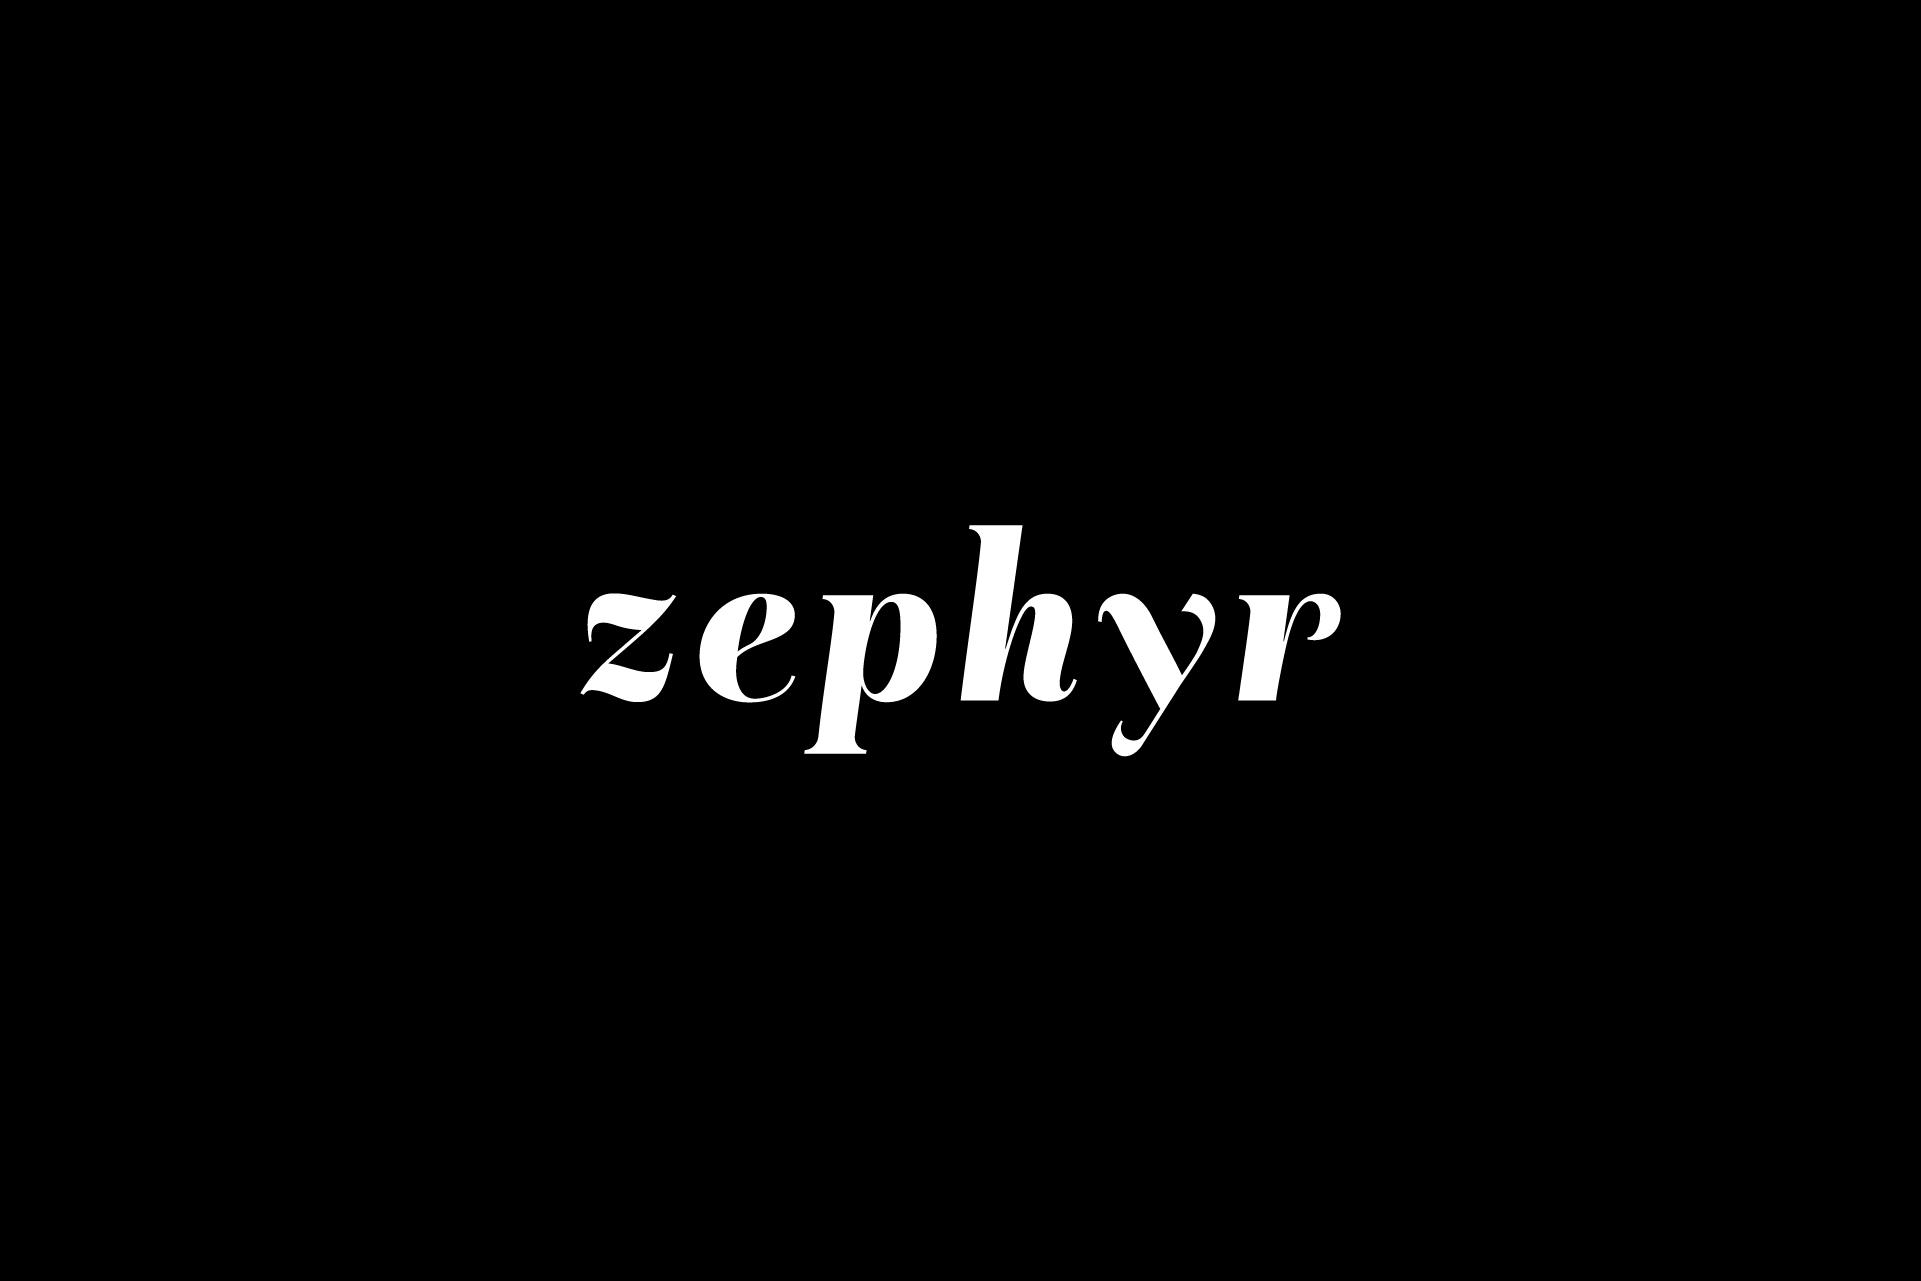 zephyr_white-2